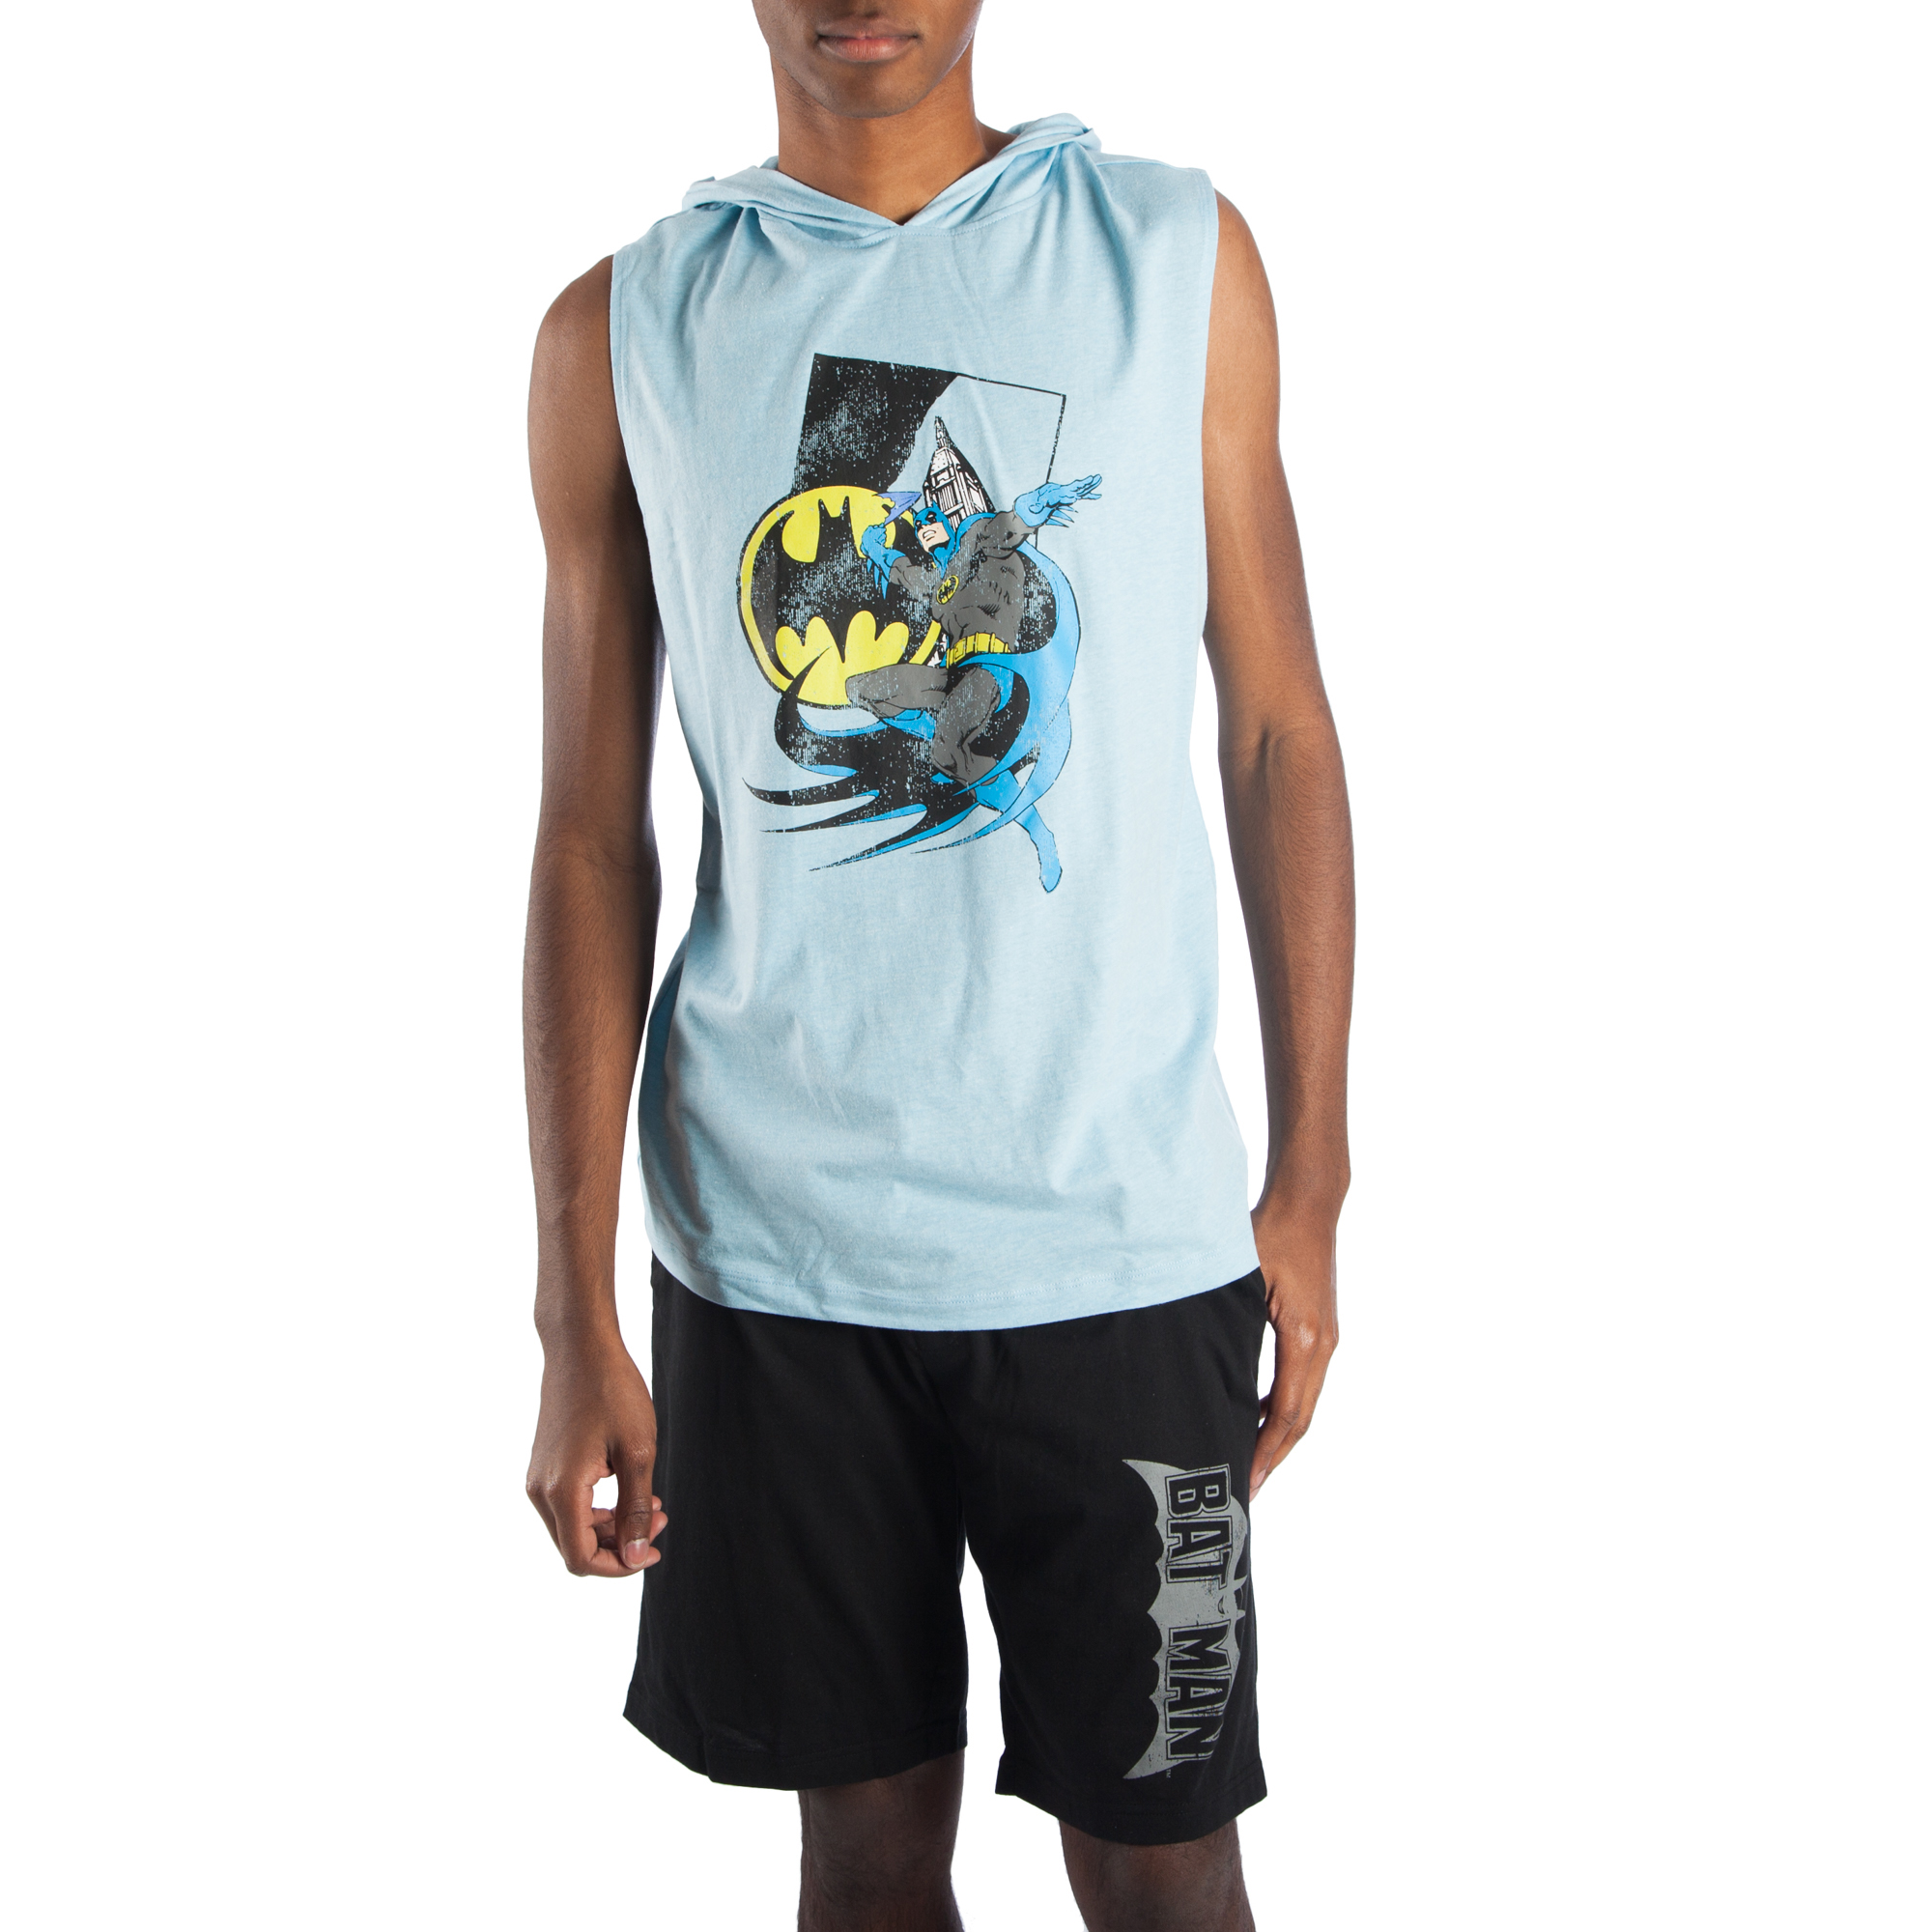 Men's 2 Piece Classic Batman Muscle Tee Hoodie and Sleep Short Pajama Lounge Combo, Size... by Generic